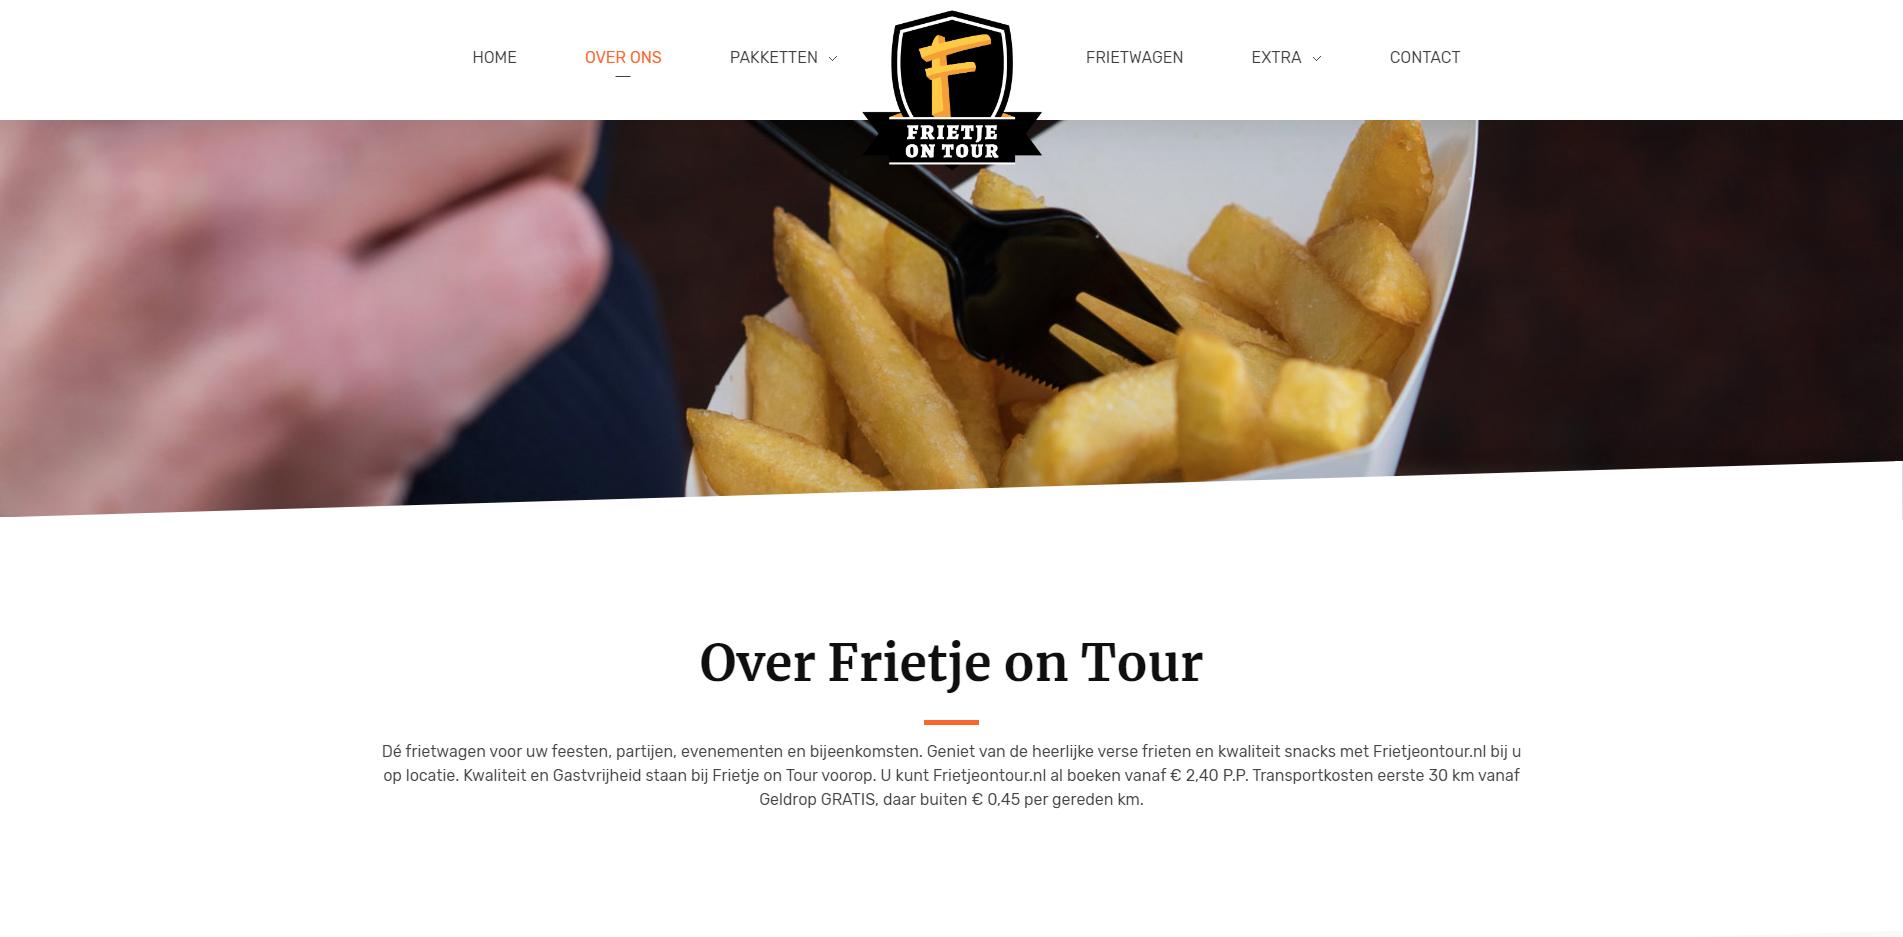 frietjeontour-overons